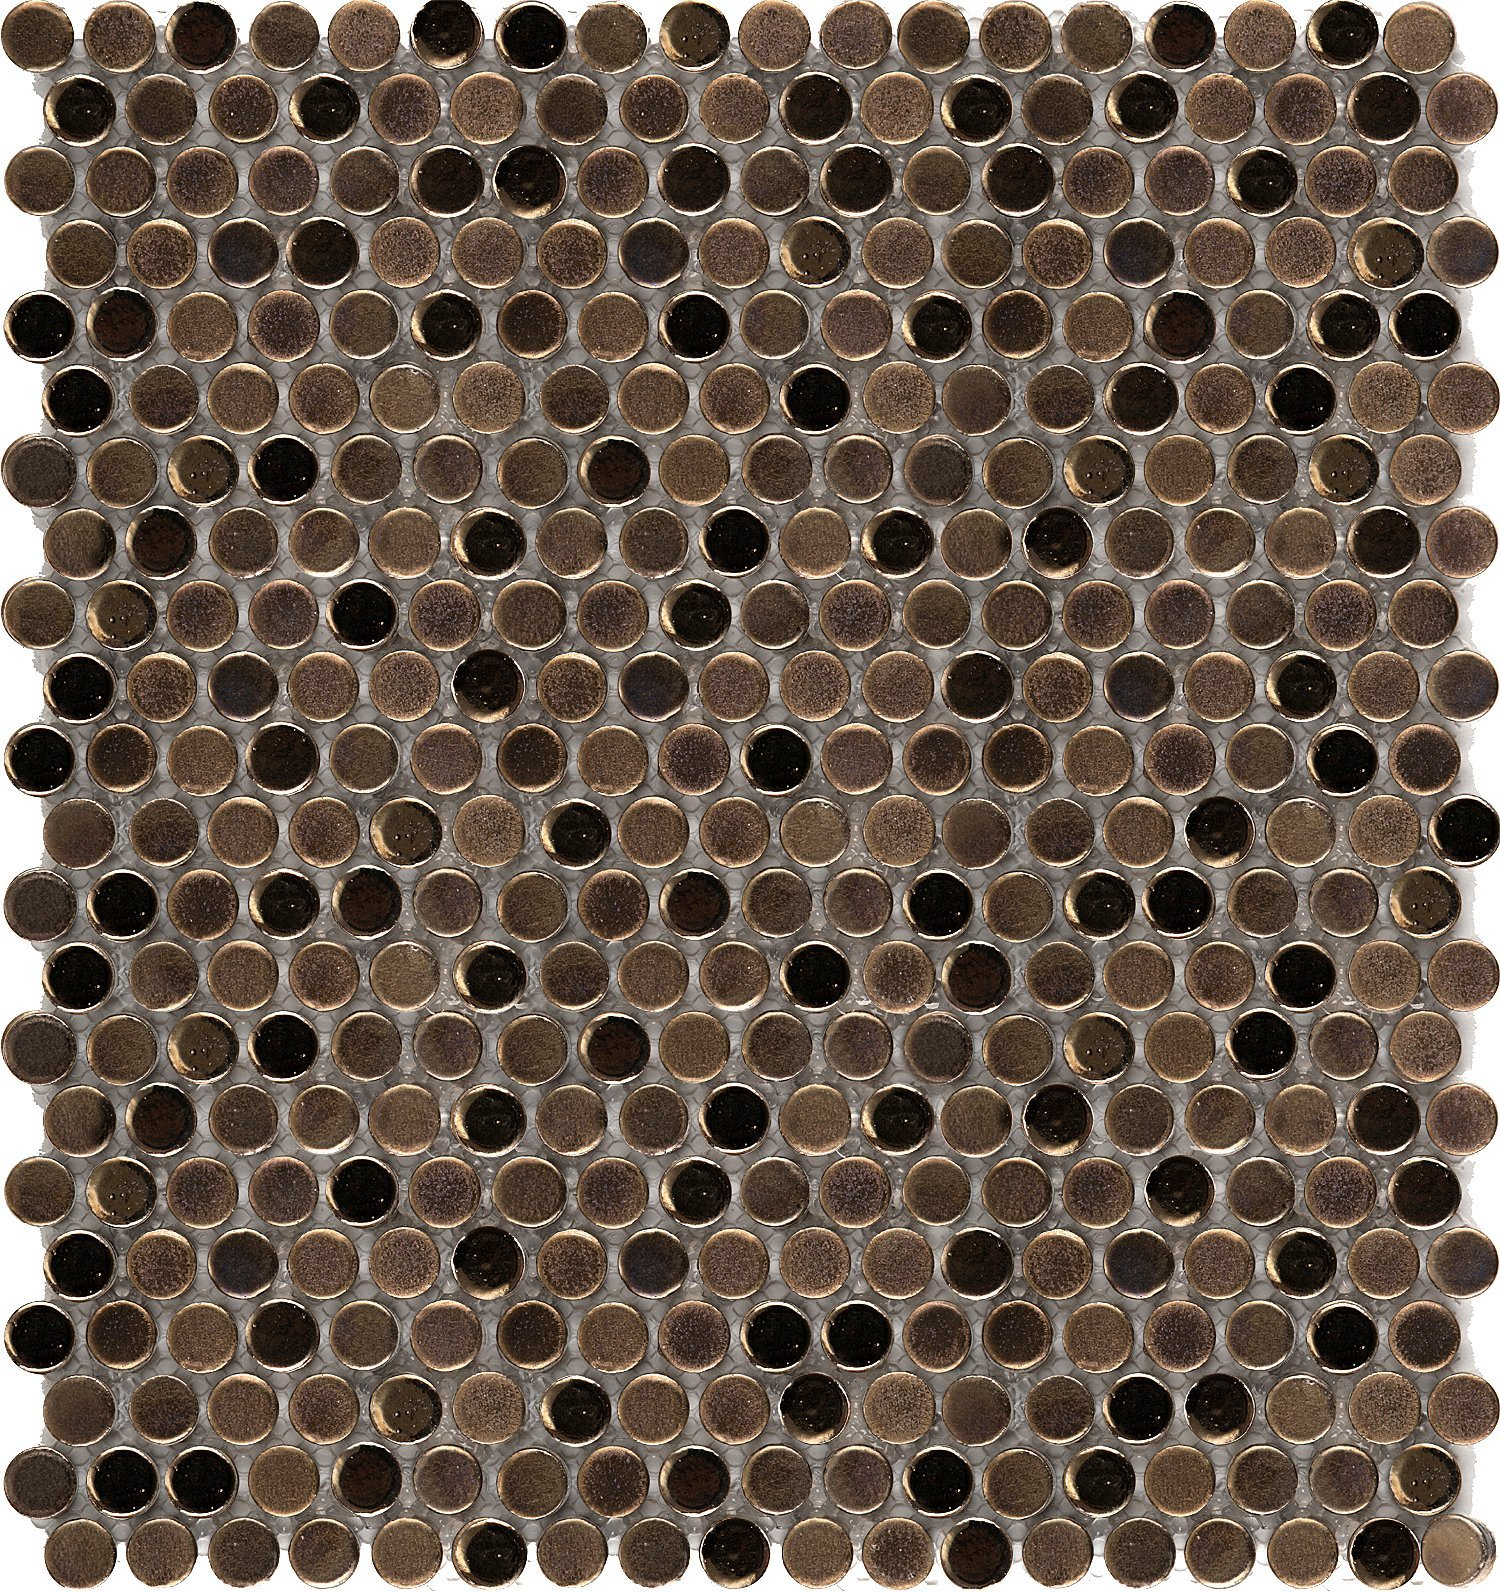 Emser Tile ''Confetti'' Penny Round Mosaics on Mesh, 12'' x 12'', Bronze by Emser Tile